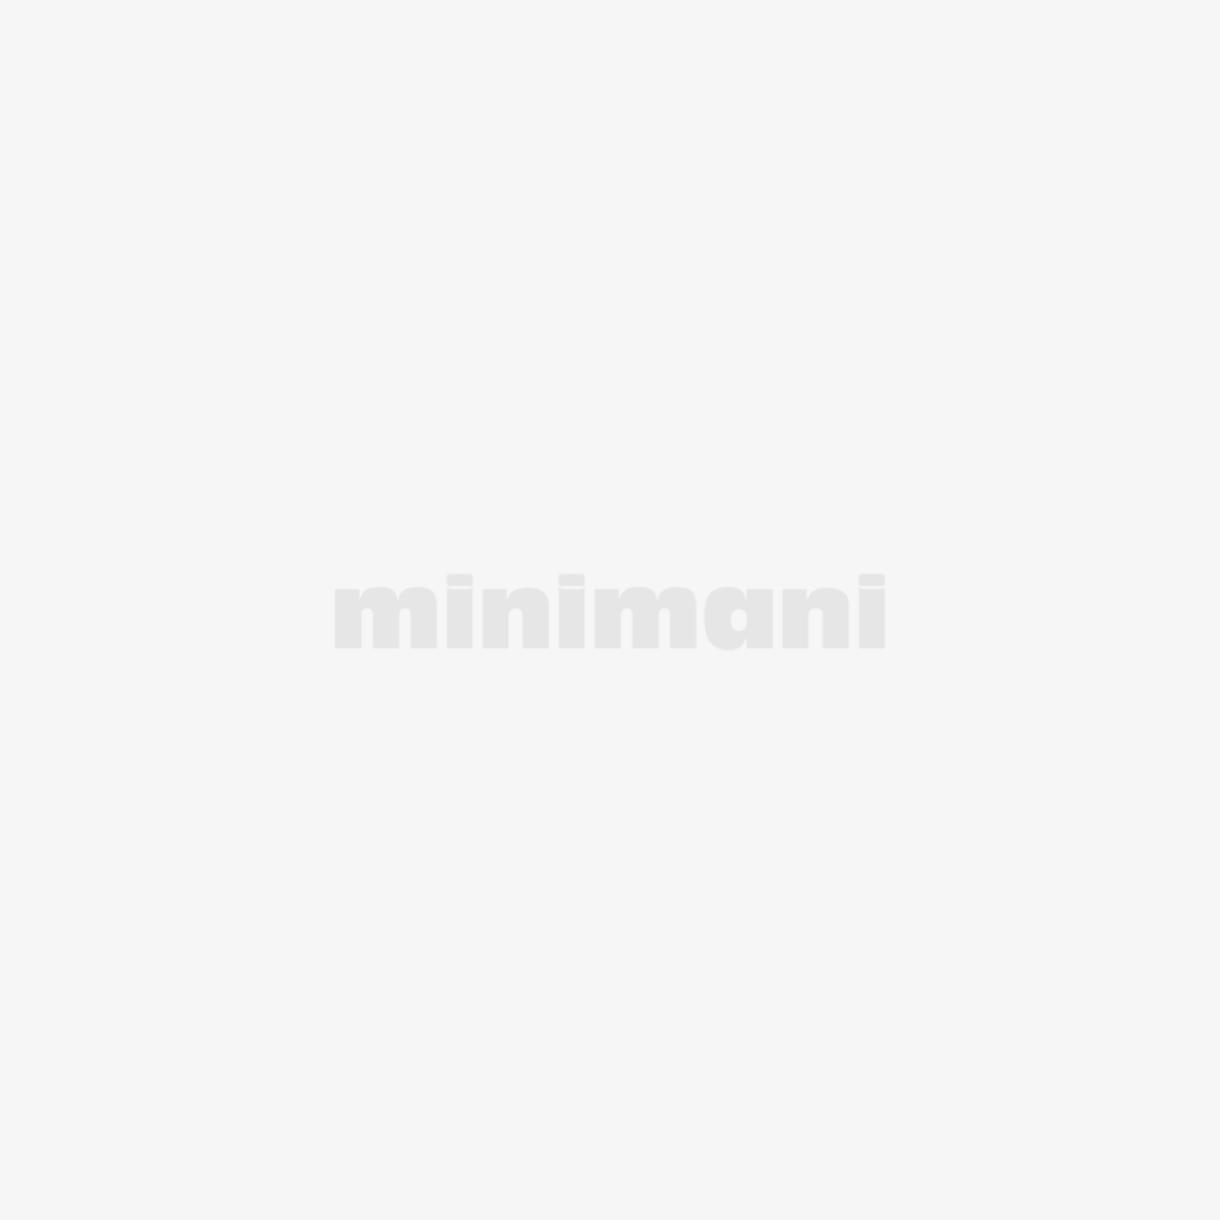 JALAS 9508 EXALTER2 S3  TURVAJALKINE KOKO 38